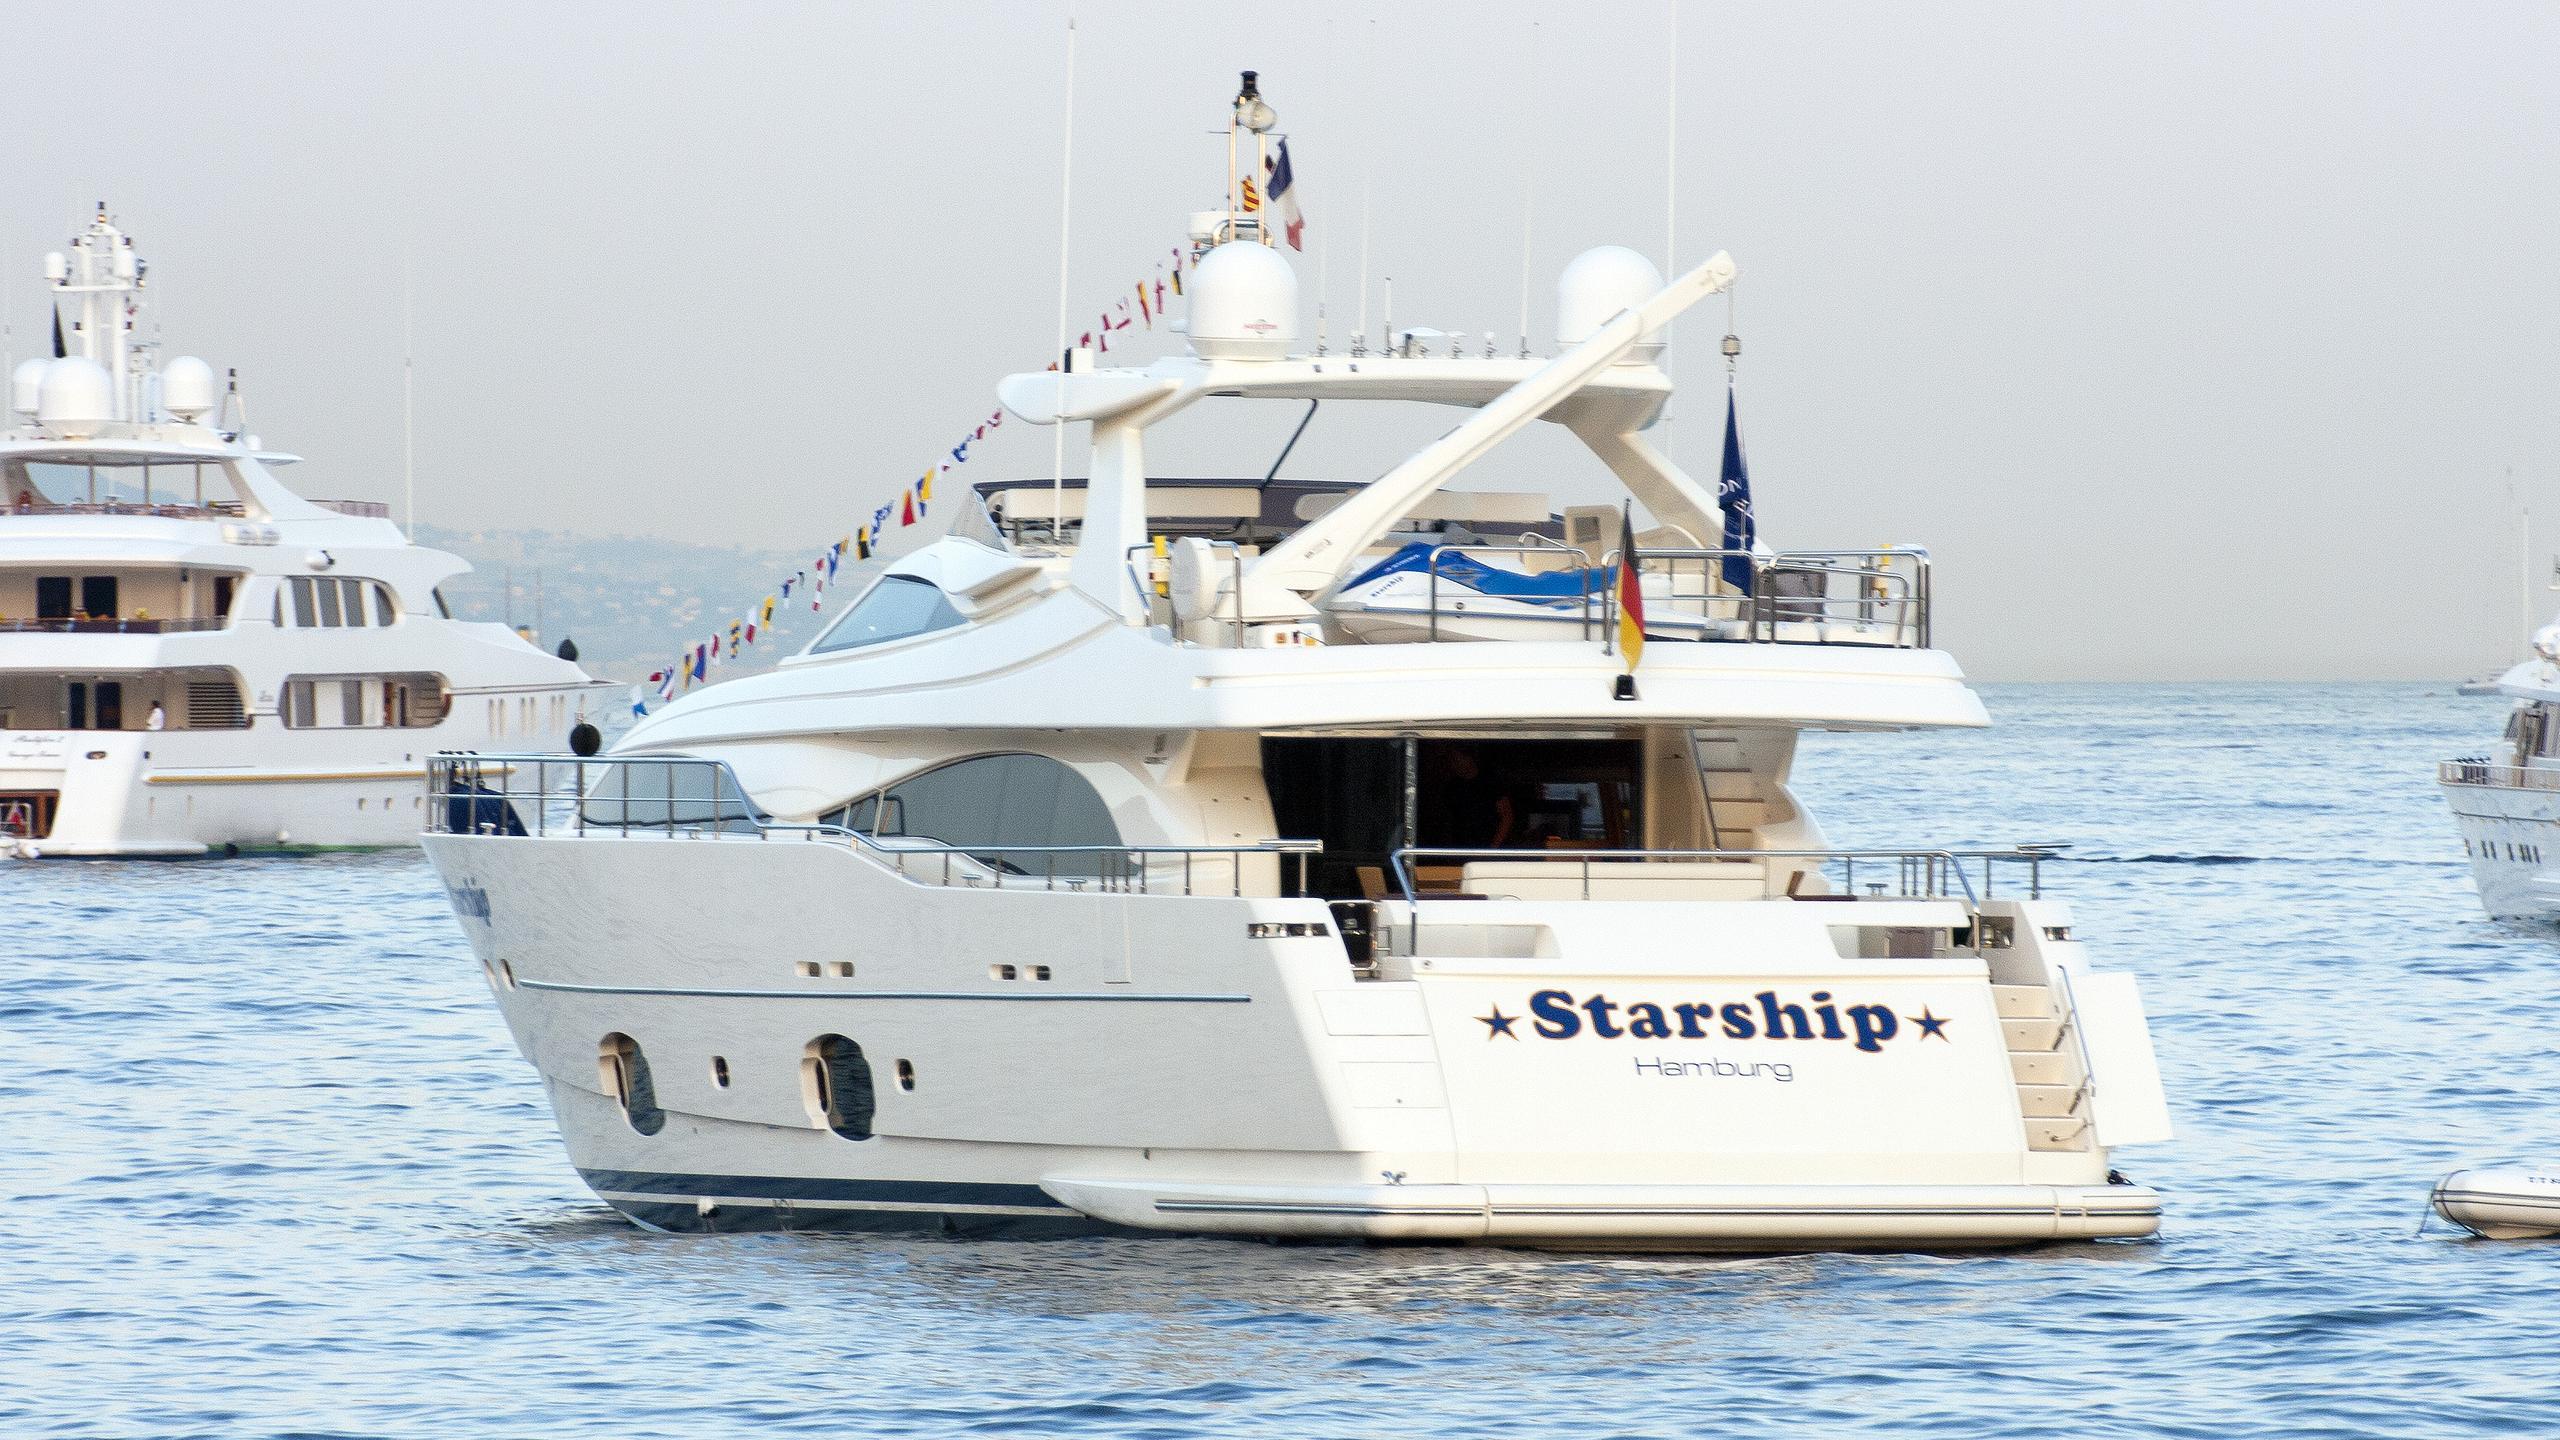 starship-motoryacht-ferretti-custom-line-97-2007-29m-stern